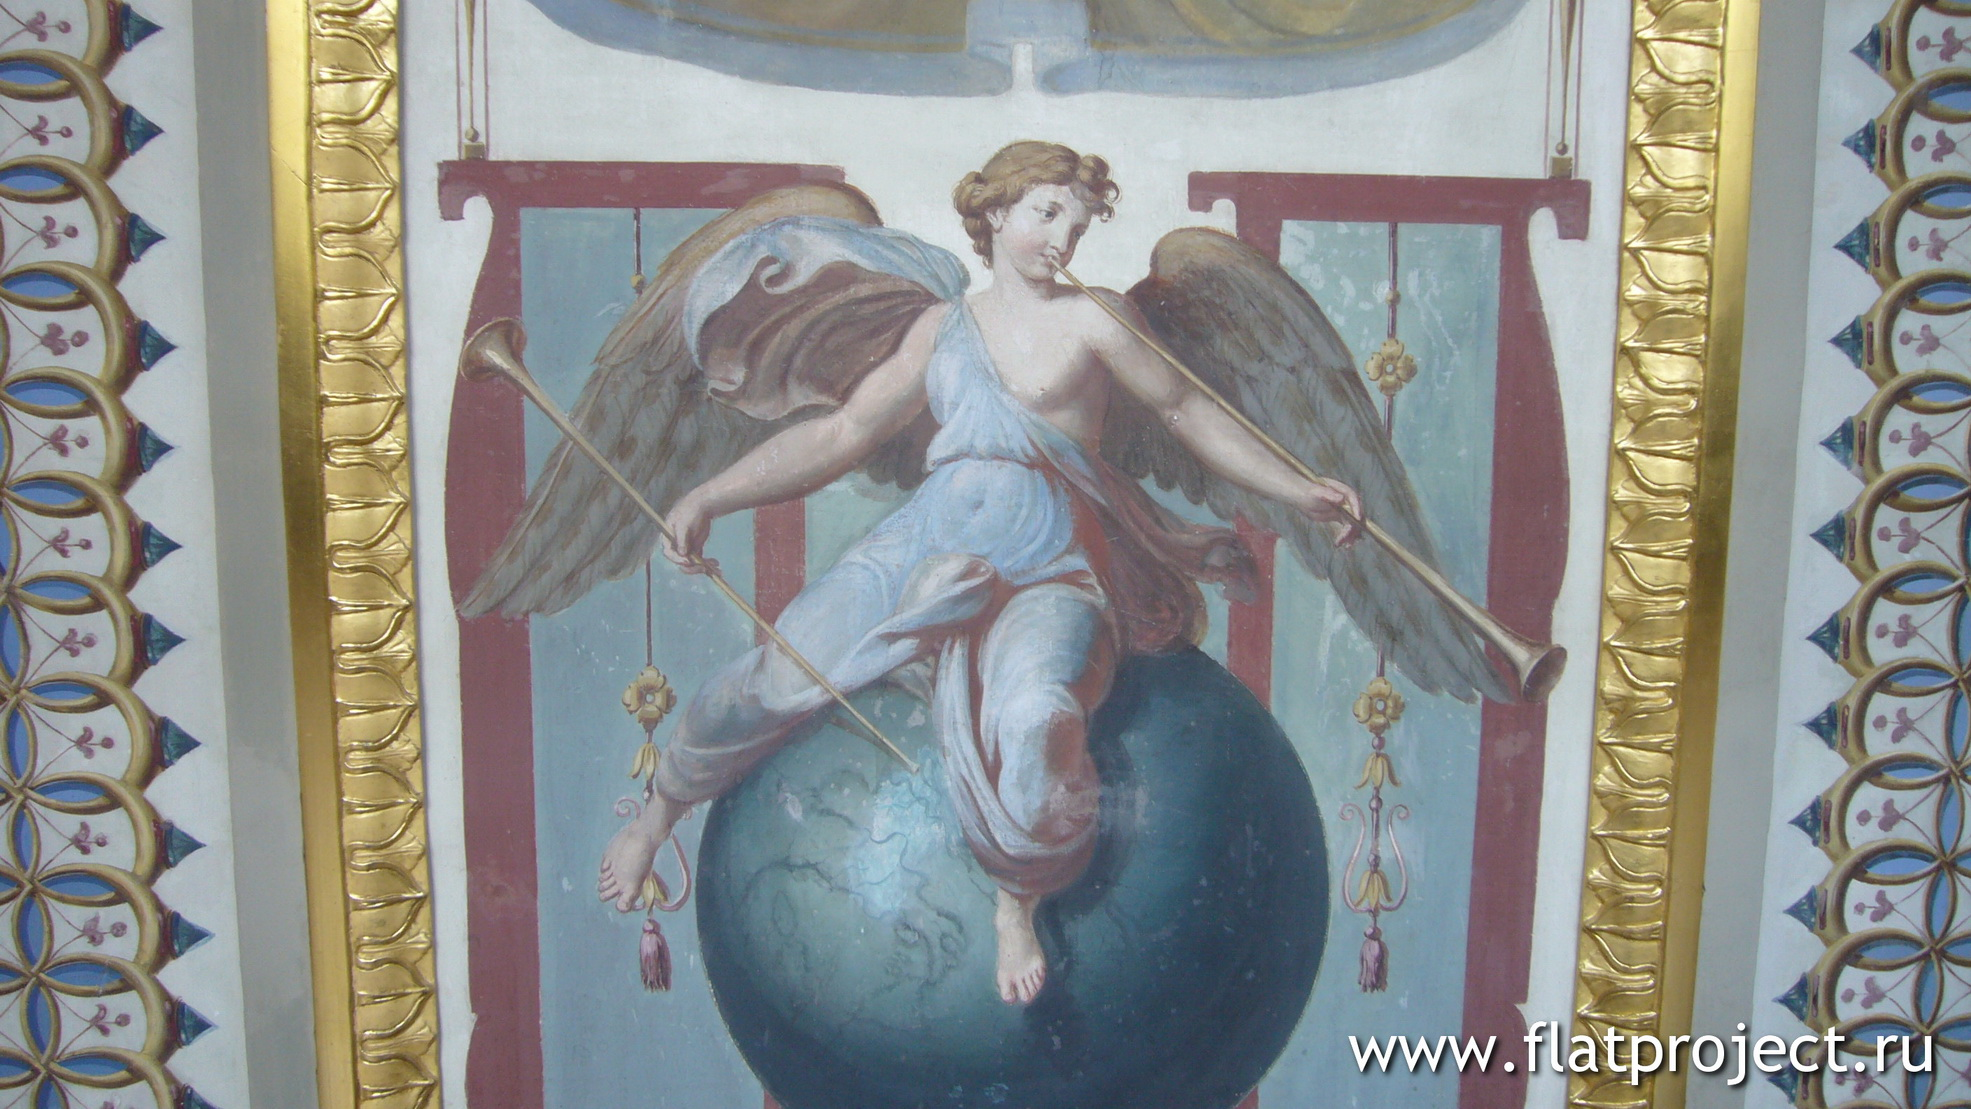 The State Hermitage museum interiors – photo 151